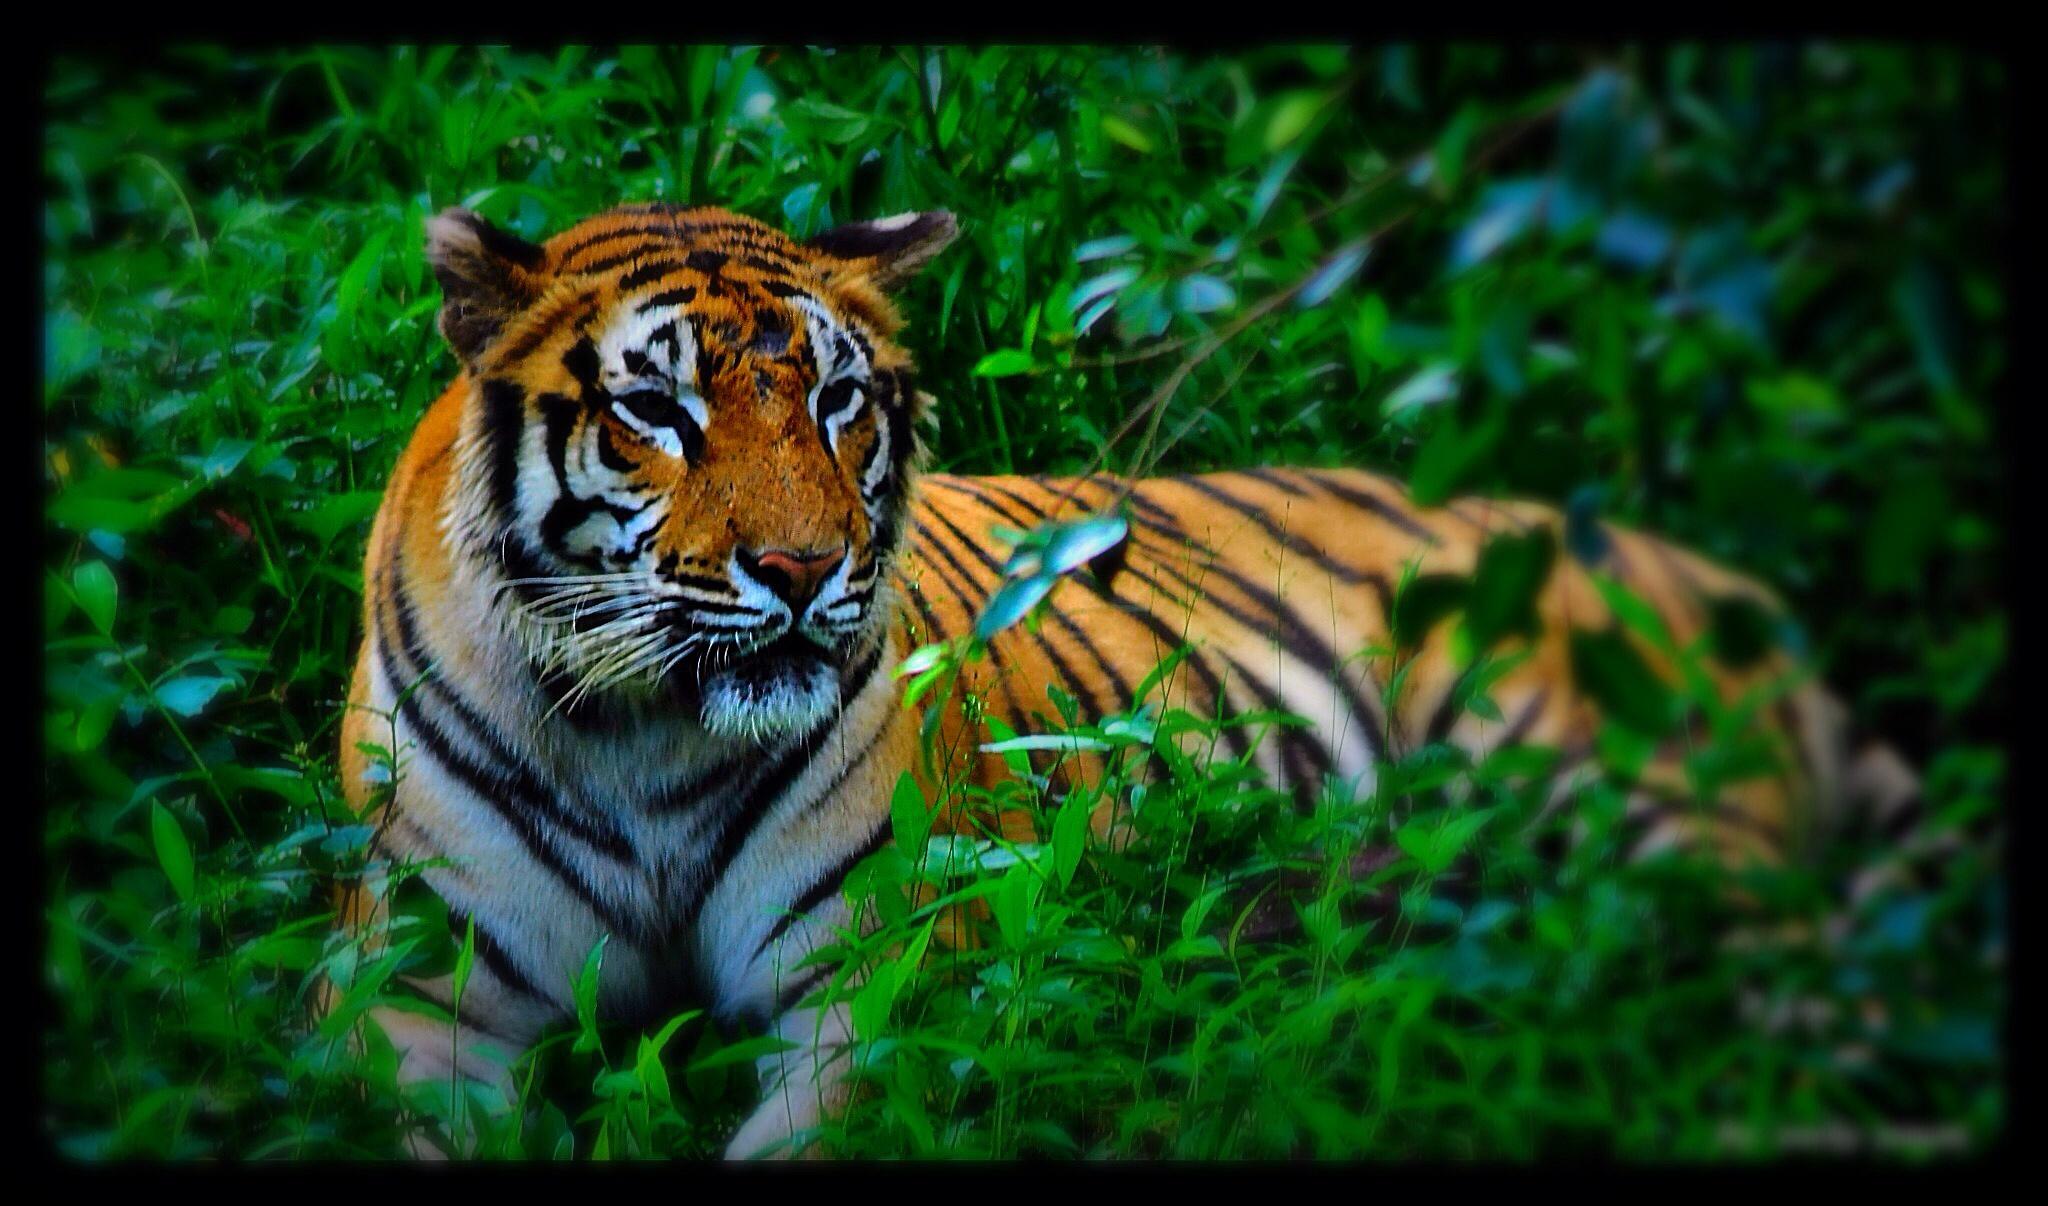 Tiger of sumatra by Muzakir Jawas